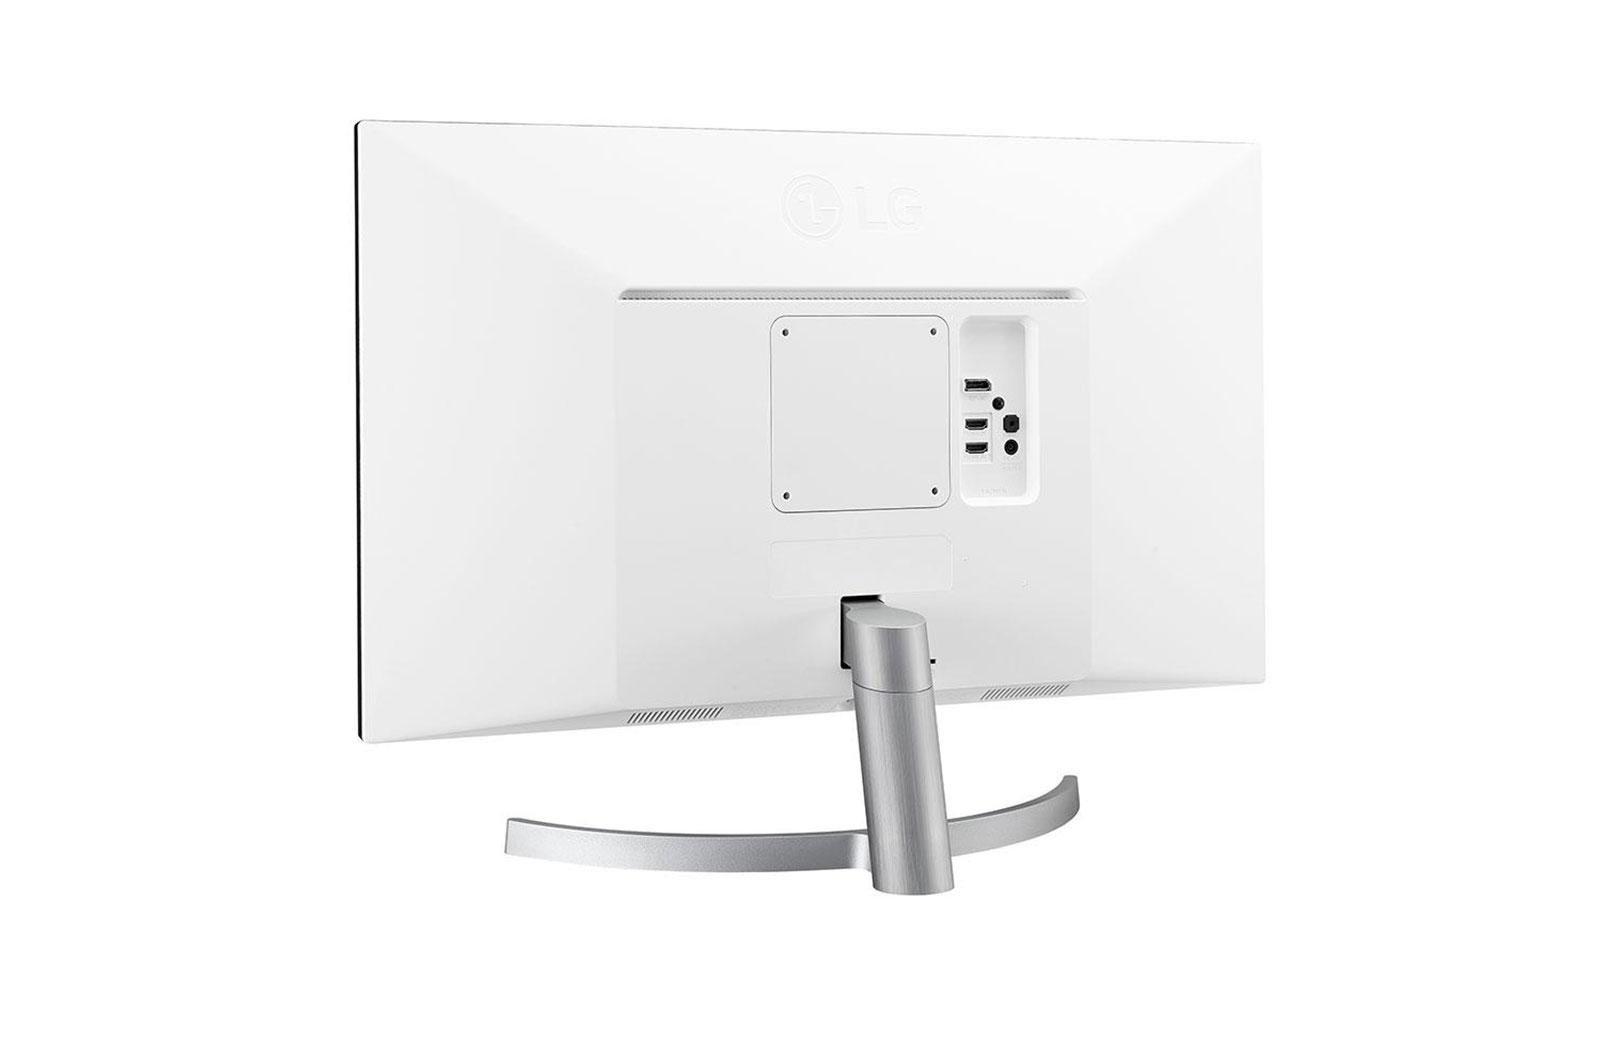 "Monitor 27"" LG 27UL600-W, 4K UHD 3840*2160, IPS, 16:9, 5 ms, 350 cd/m2, 1000:1, 178/178, anti-glare 3H, HDR 10, DisplayHDR™ 400, Flicker safe, RADEON FreeSync, 2*HDMI, DP, 60 Hz, headphone out, VESA 100*100, cabluri HDMI/ DP incluse, culoare alb+picior argintiu - imaginea 2"